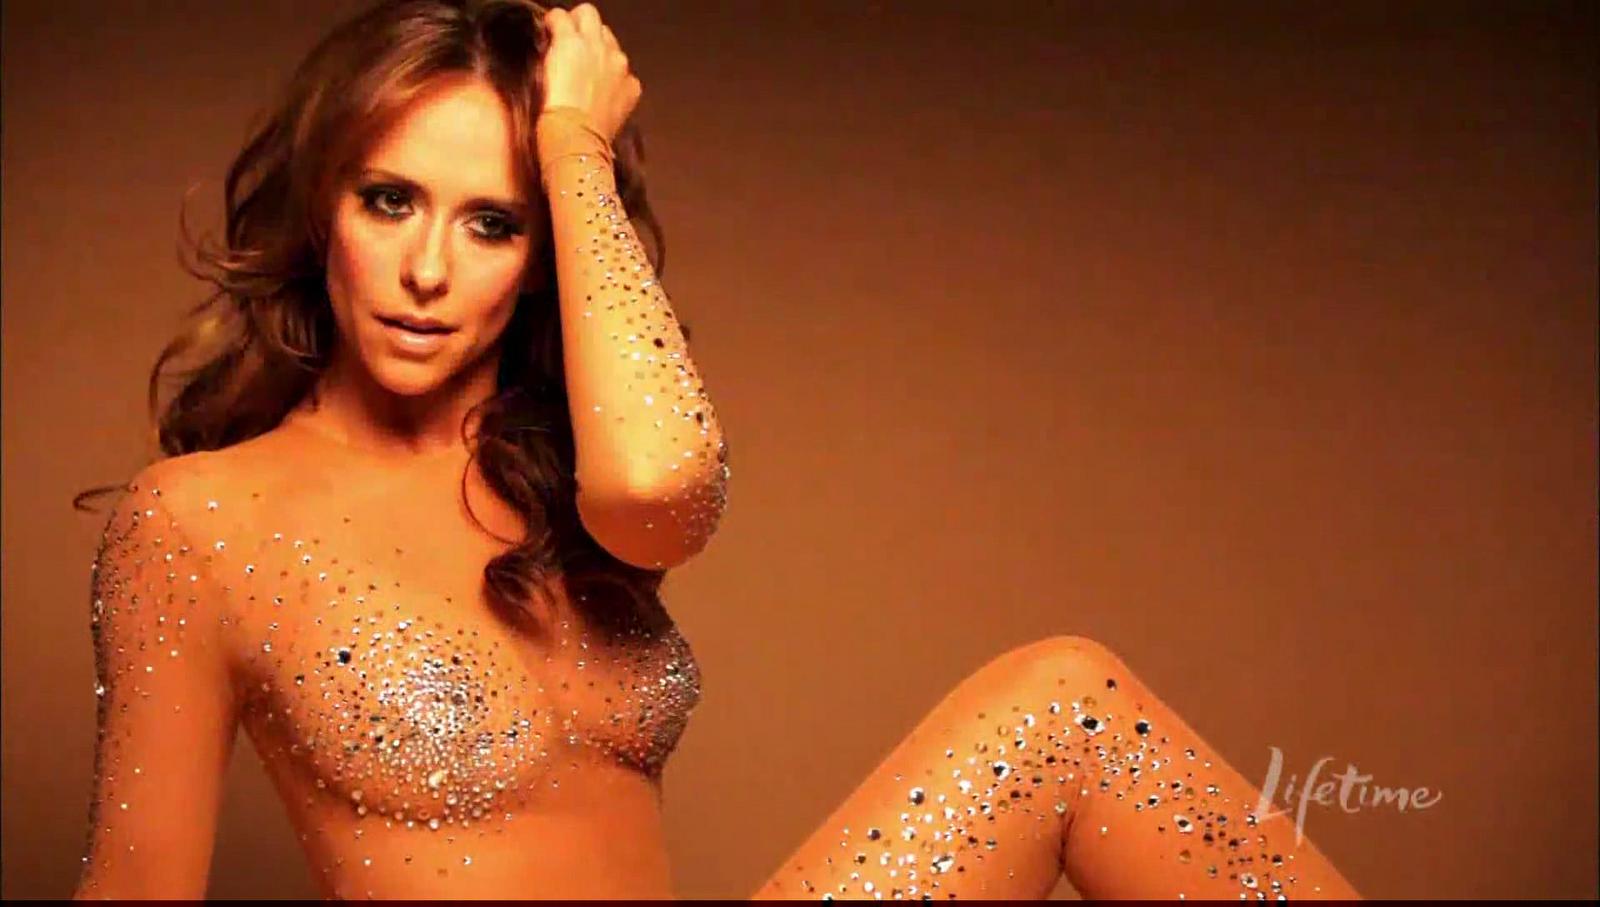 Por fin, la pechugona Jennifer Love Hewitt se desnuda